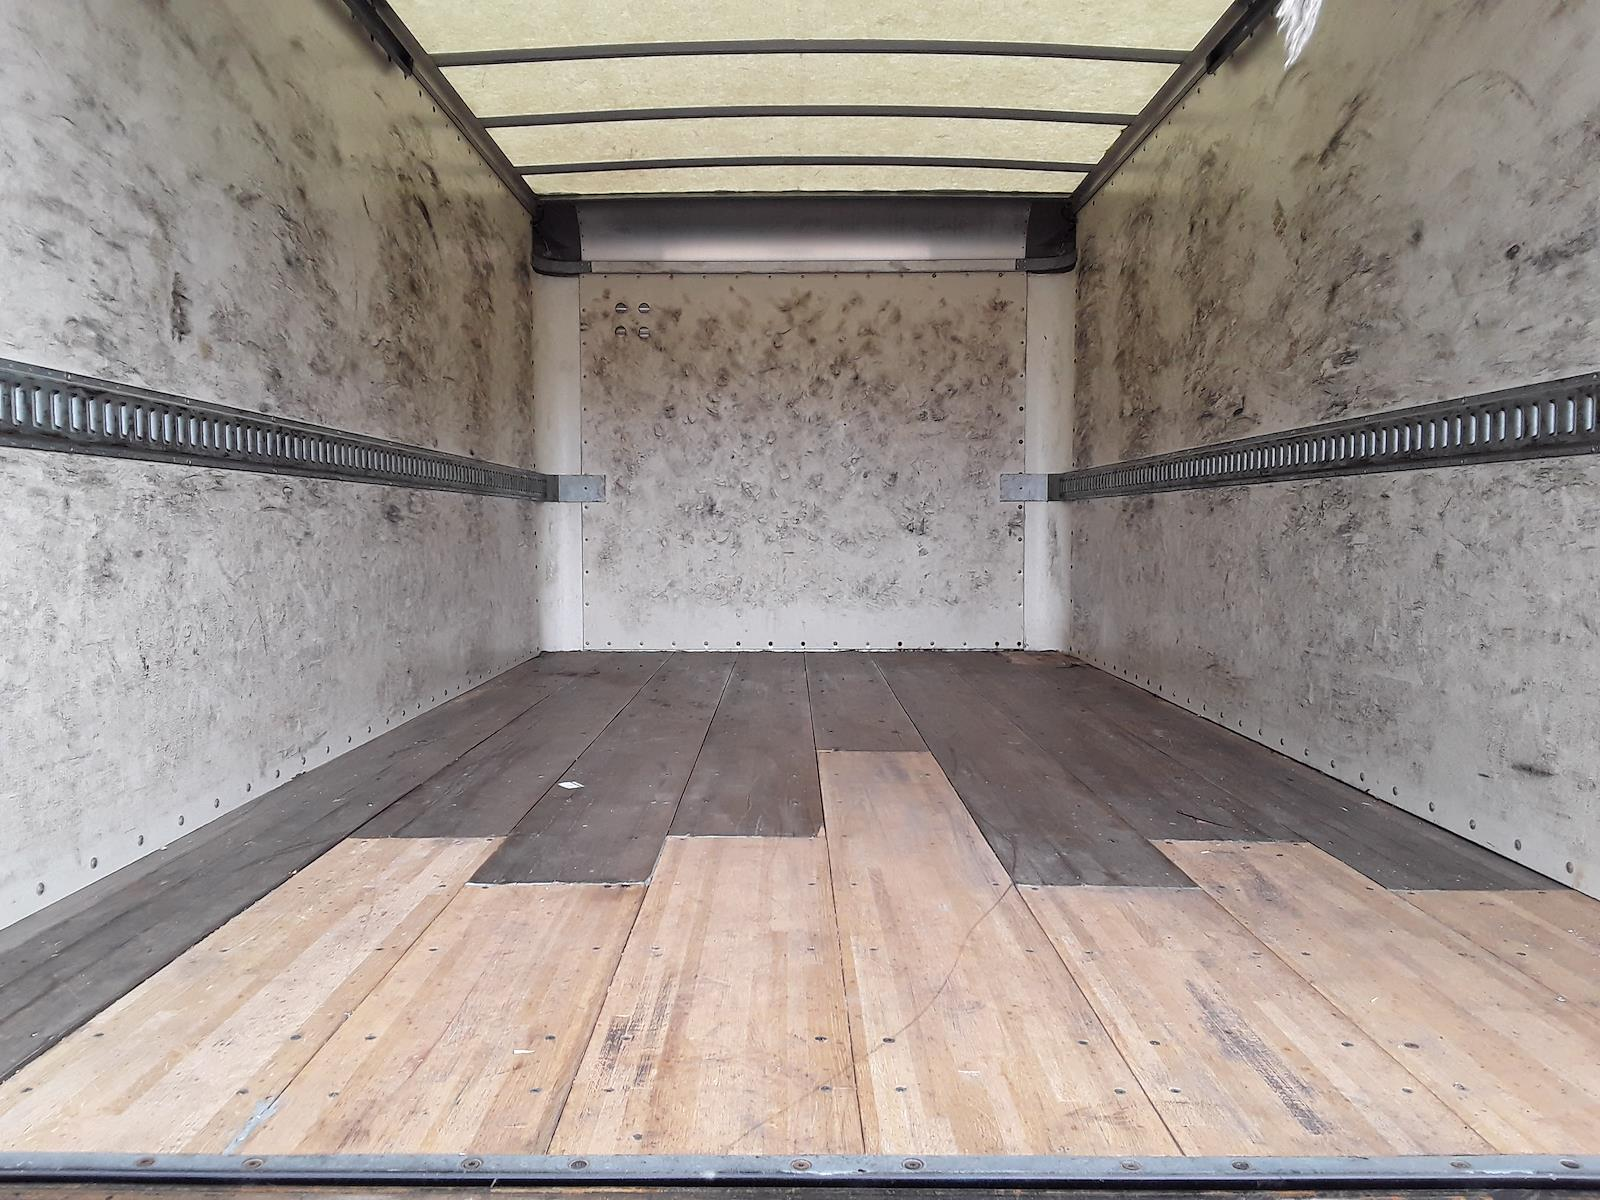 2016 Isuzu NPR Regular Cab 4x2, Dry Freight #667306 - photo 1